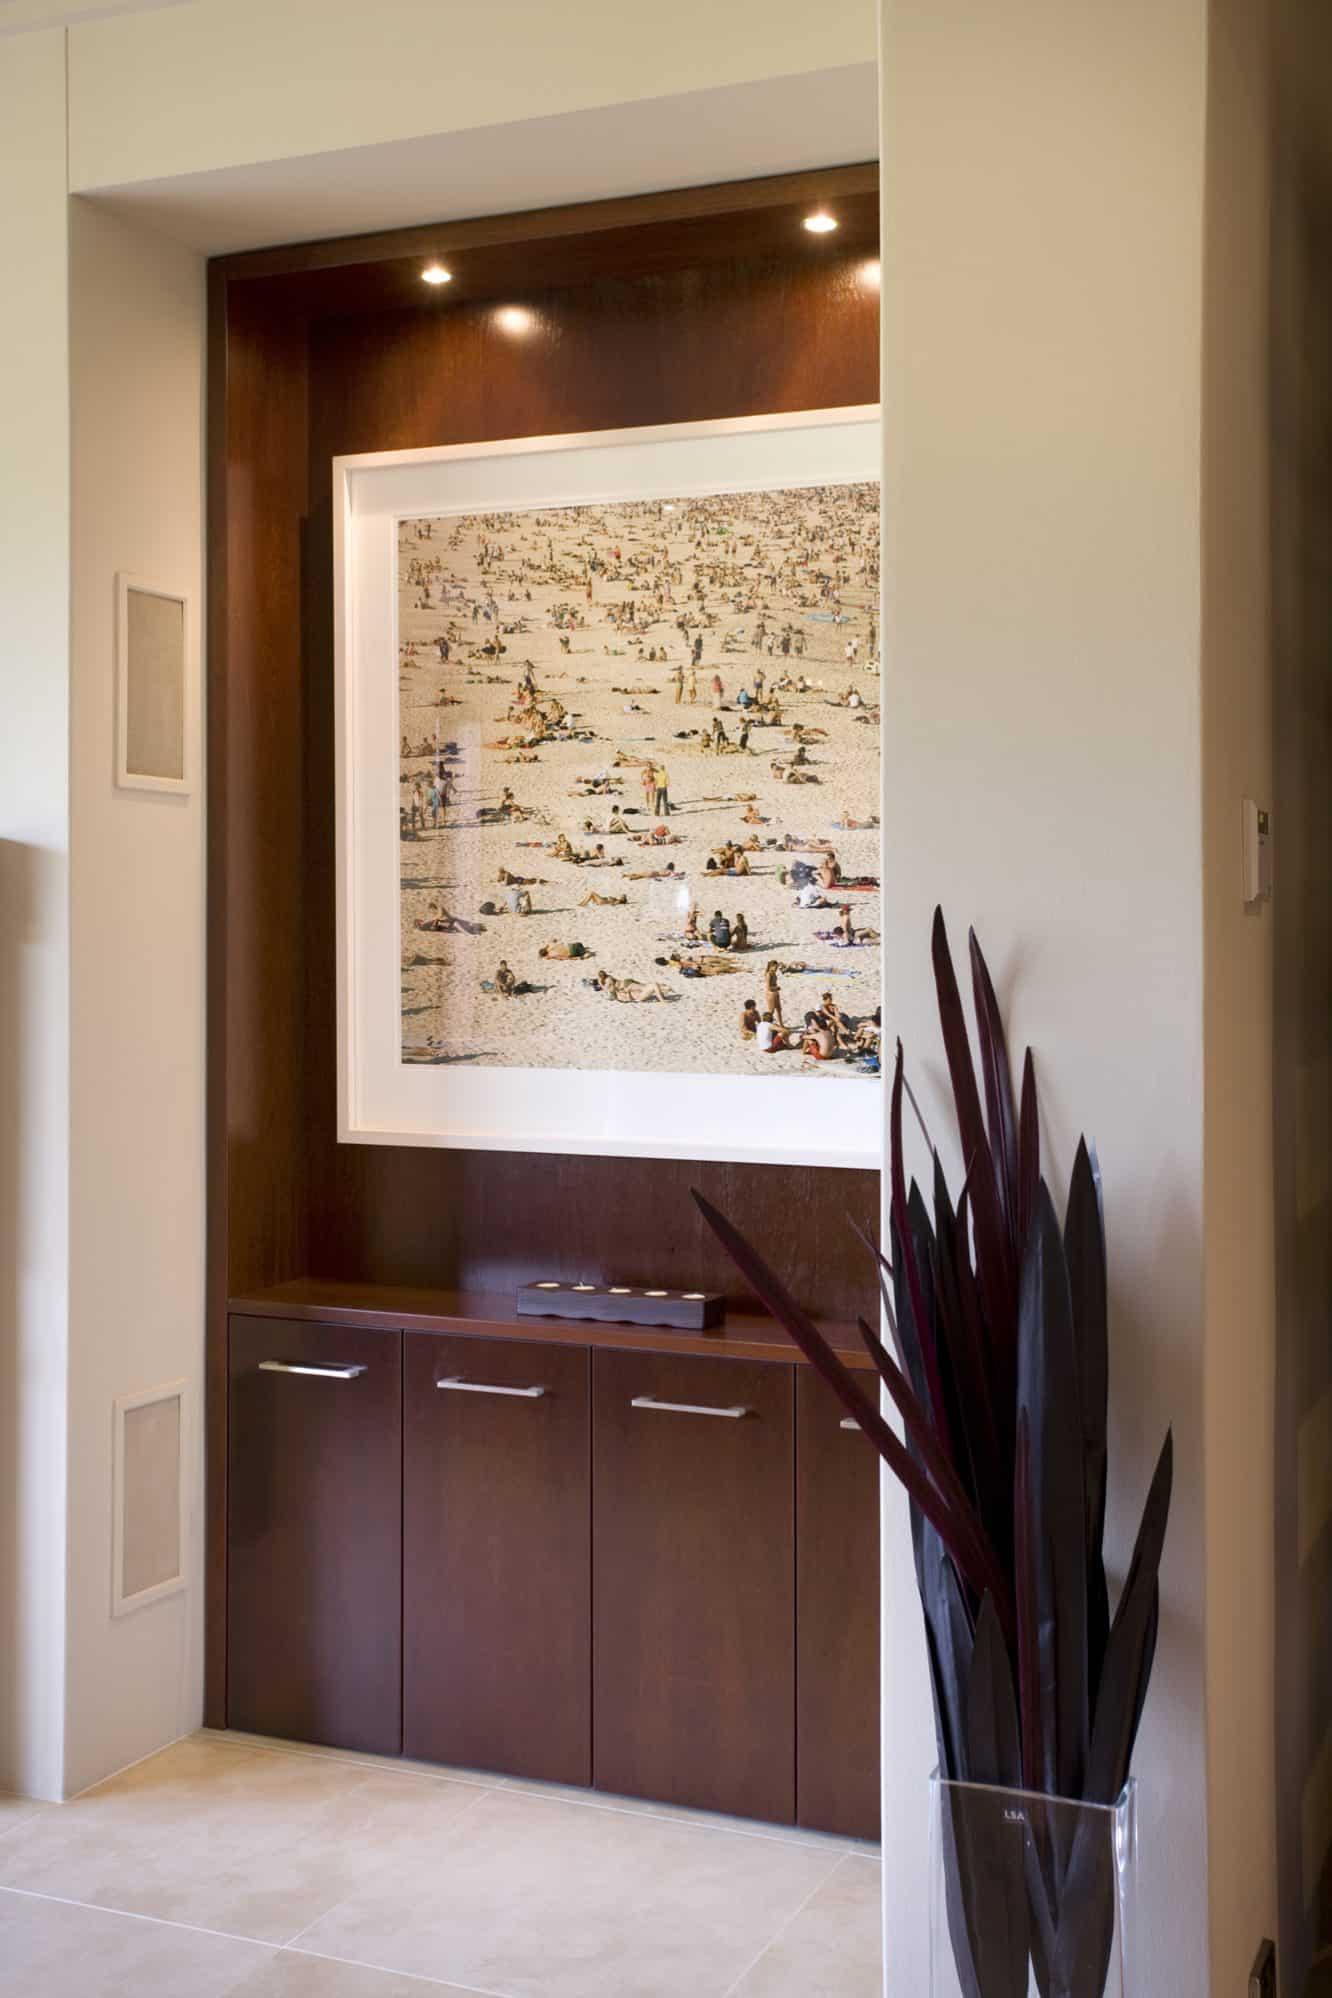 Display niche with artwork